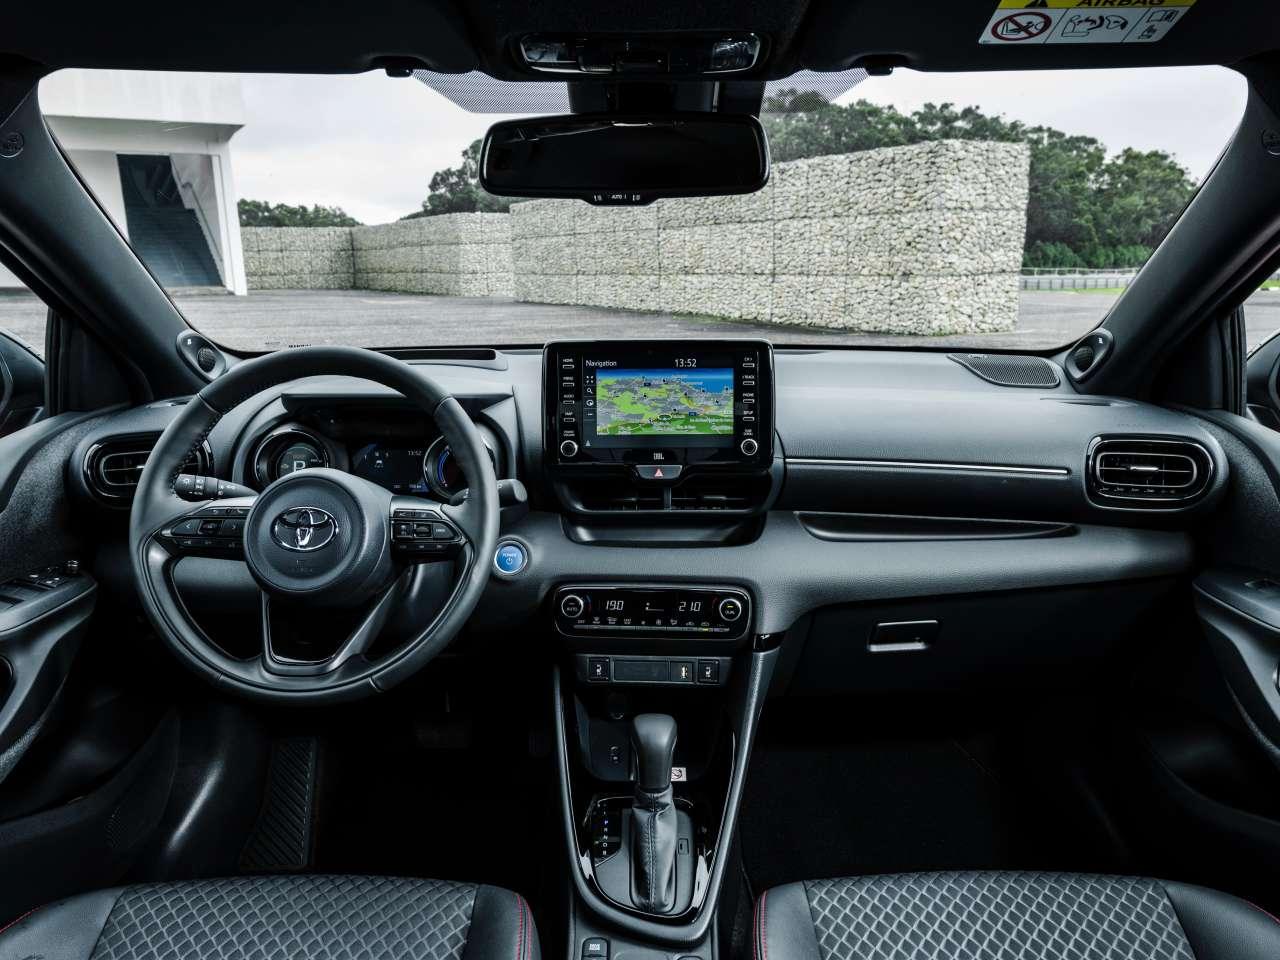 Toyota Yaris 2020 interior